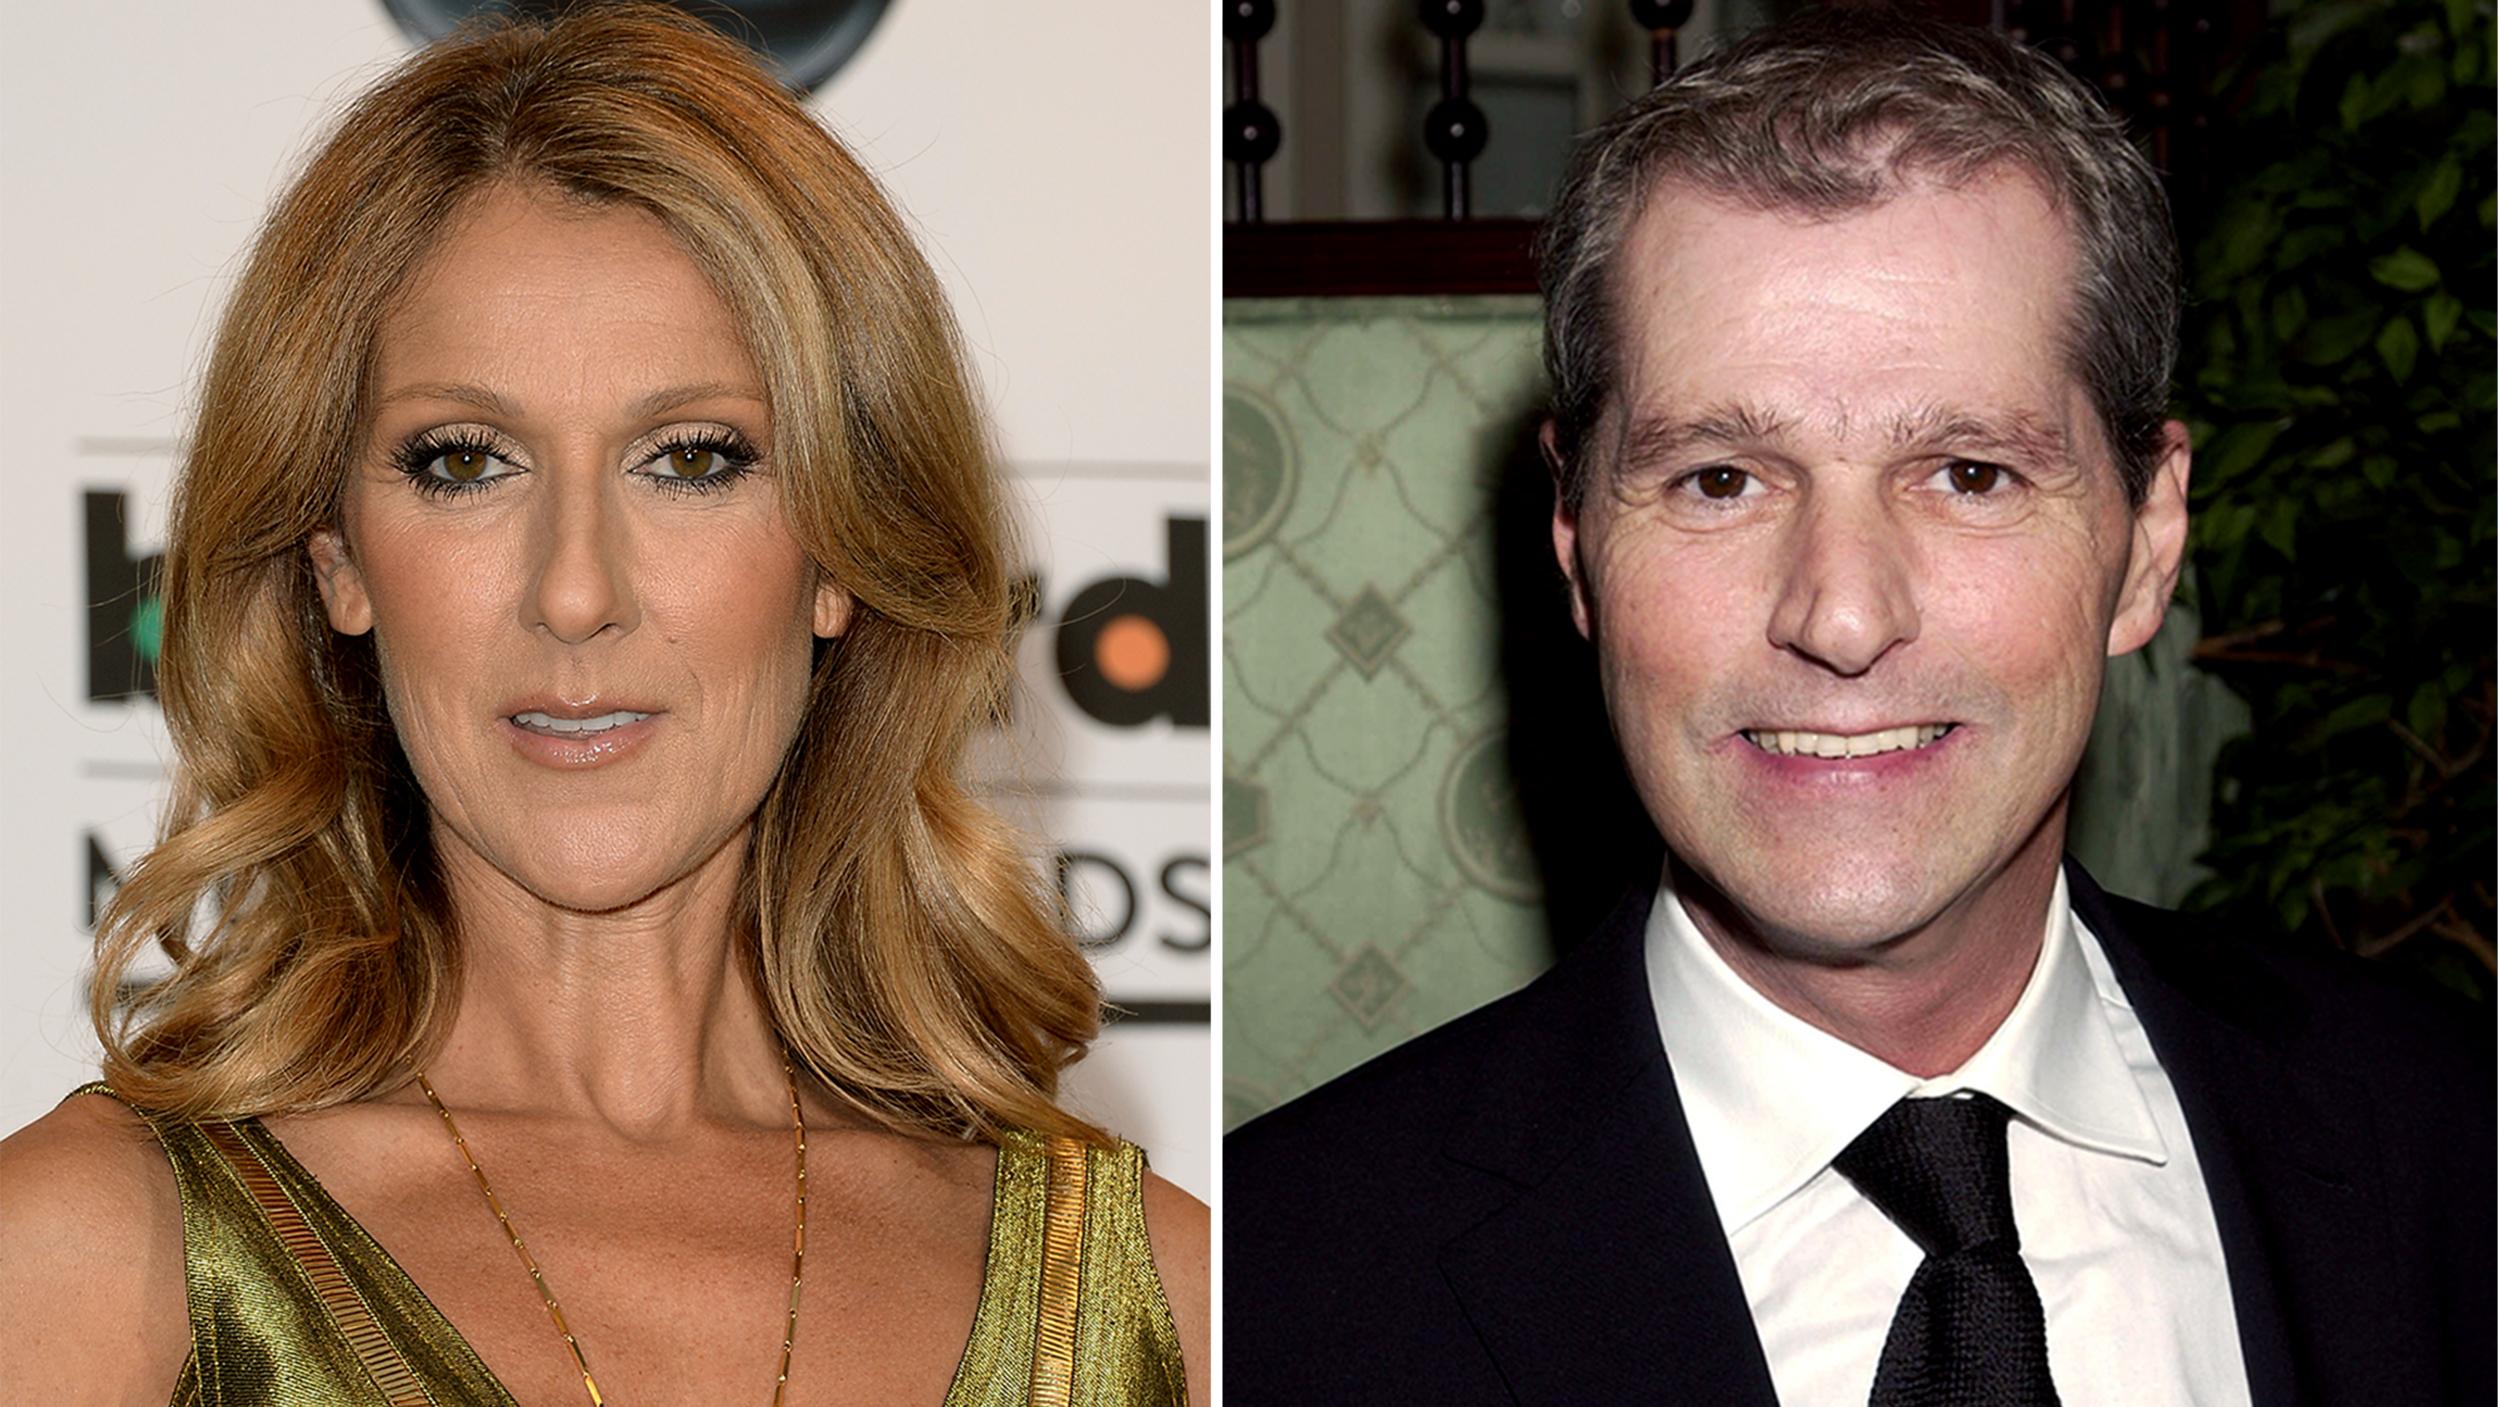 Your Light Celine Dion Celine Dion Brother Daniel Dion Today Tease Debdbaeccfdacd